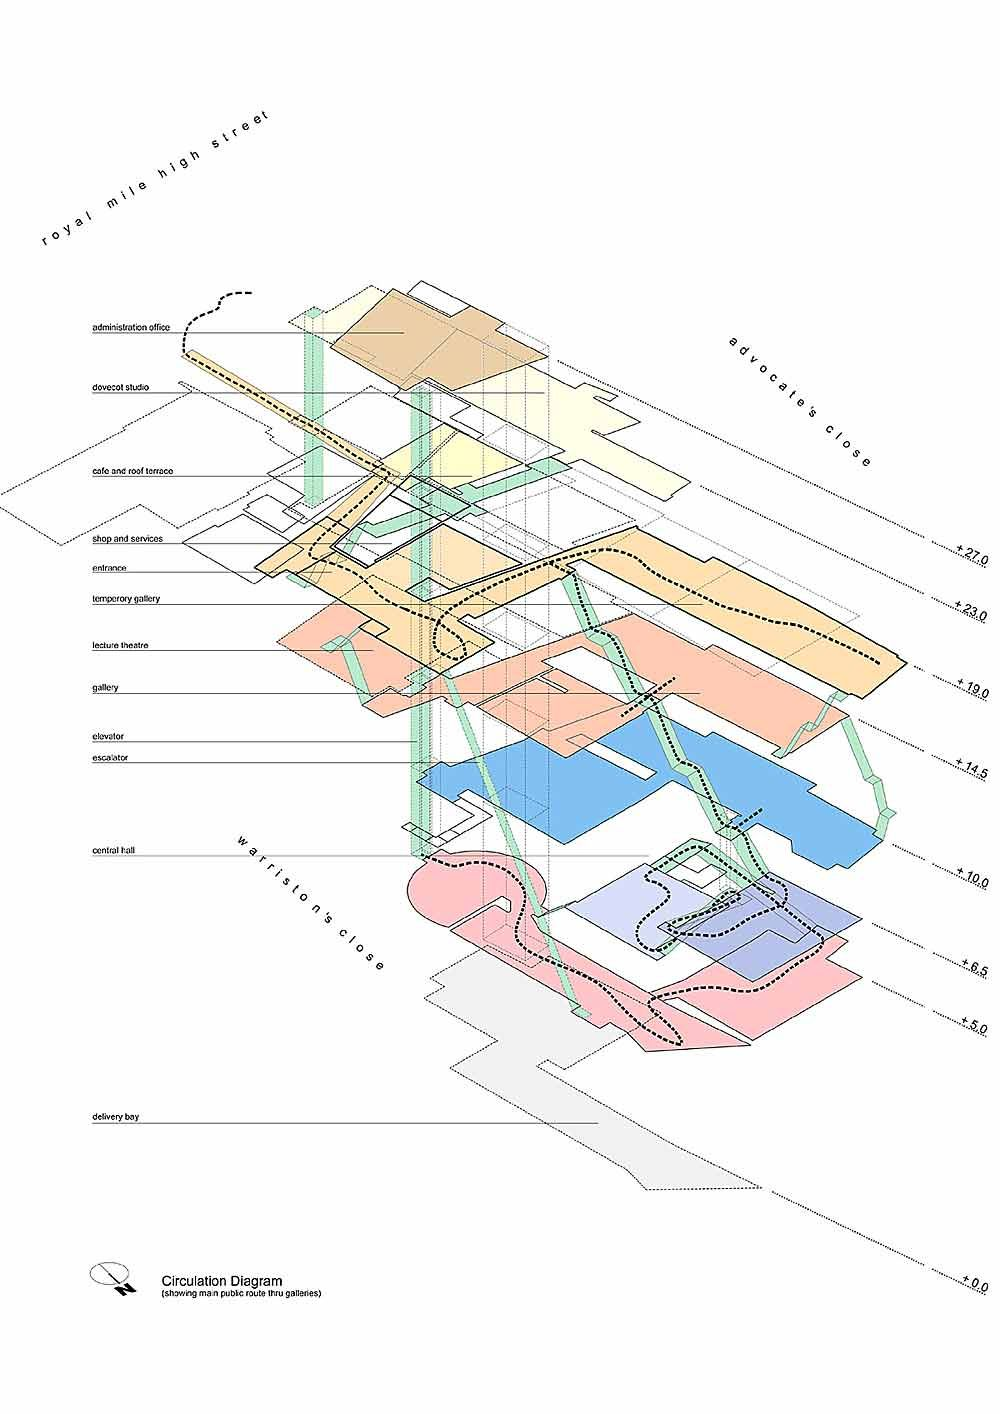 medium resolution of architectural circulation diagram google search arc607 diagram architectural circulation diagram google search